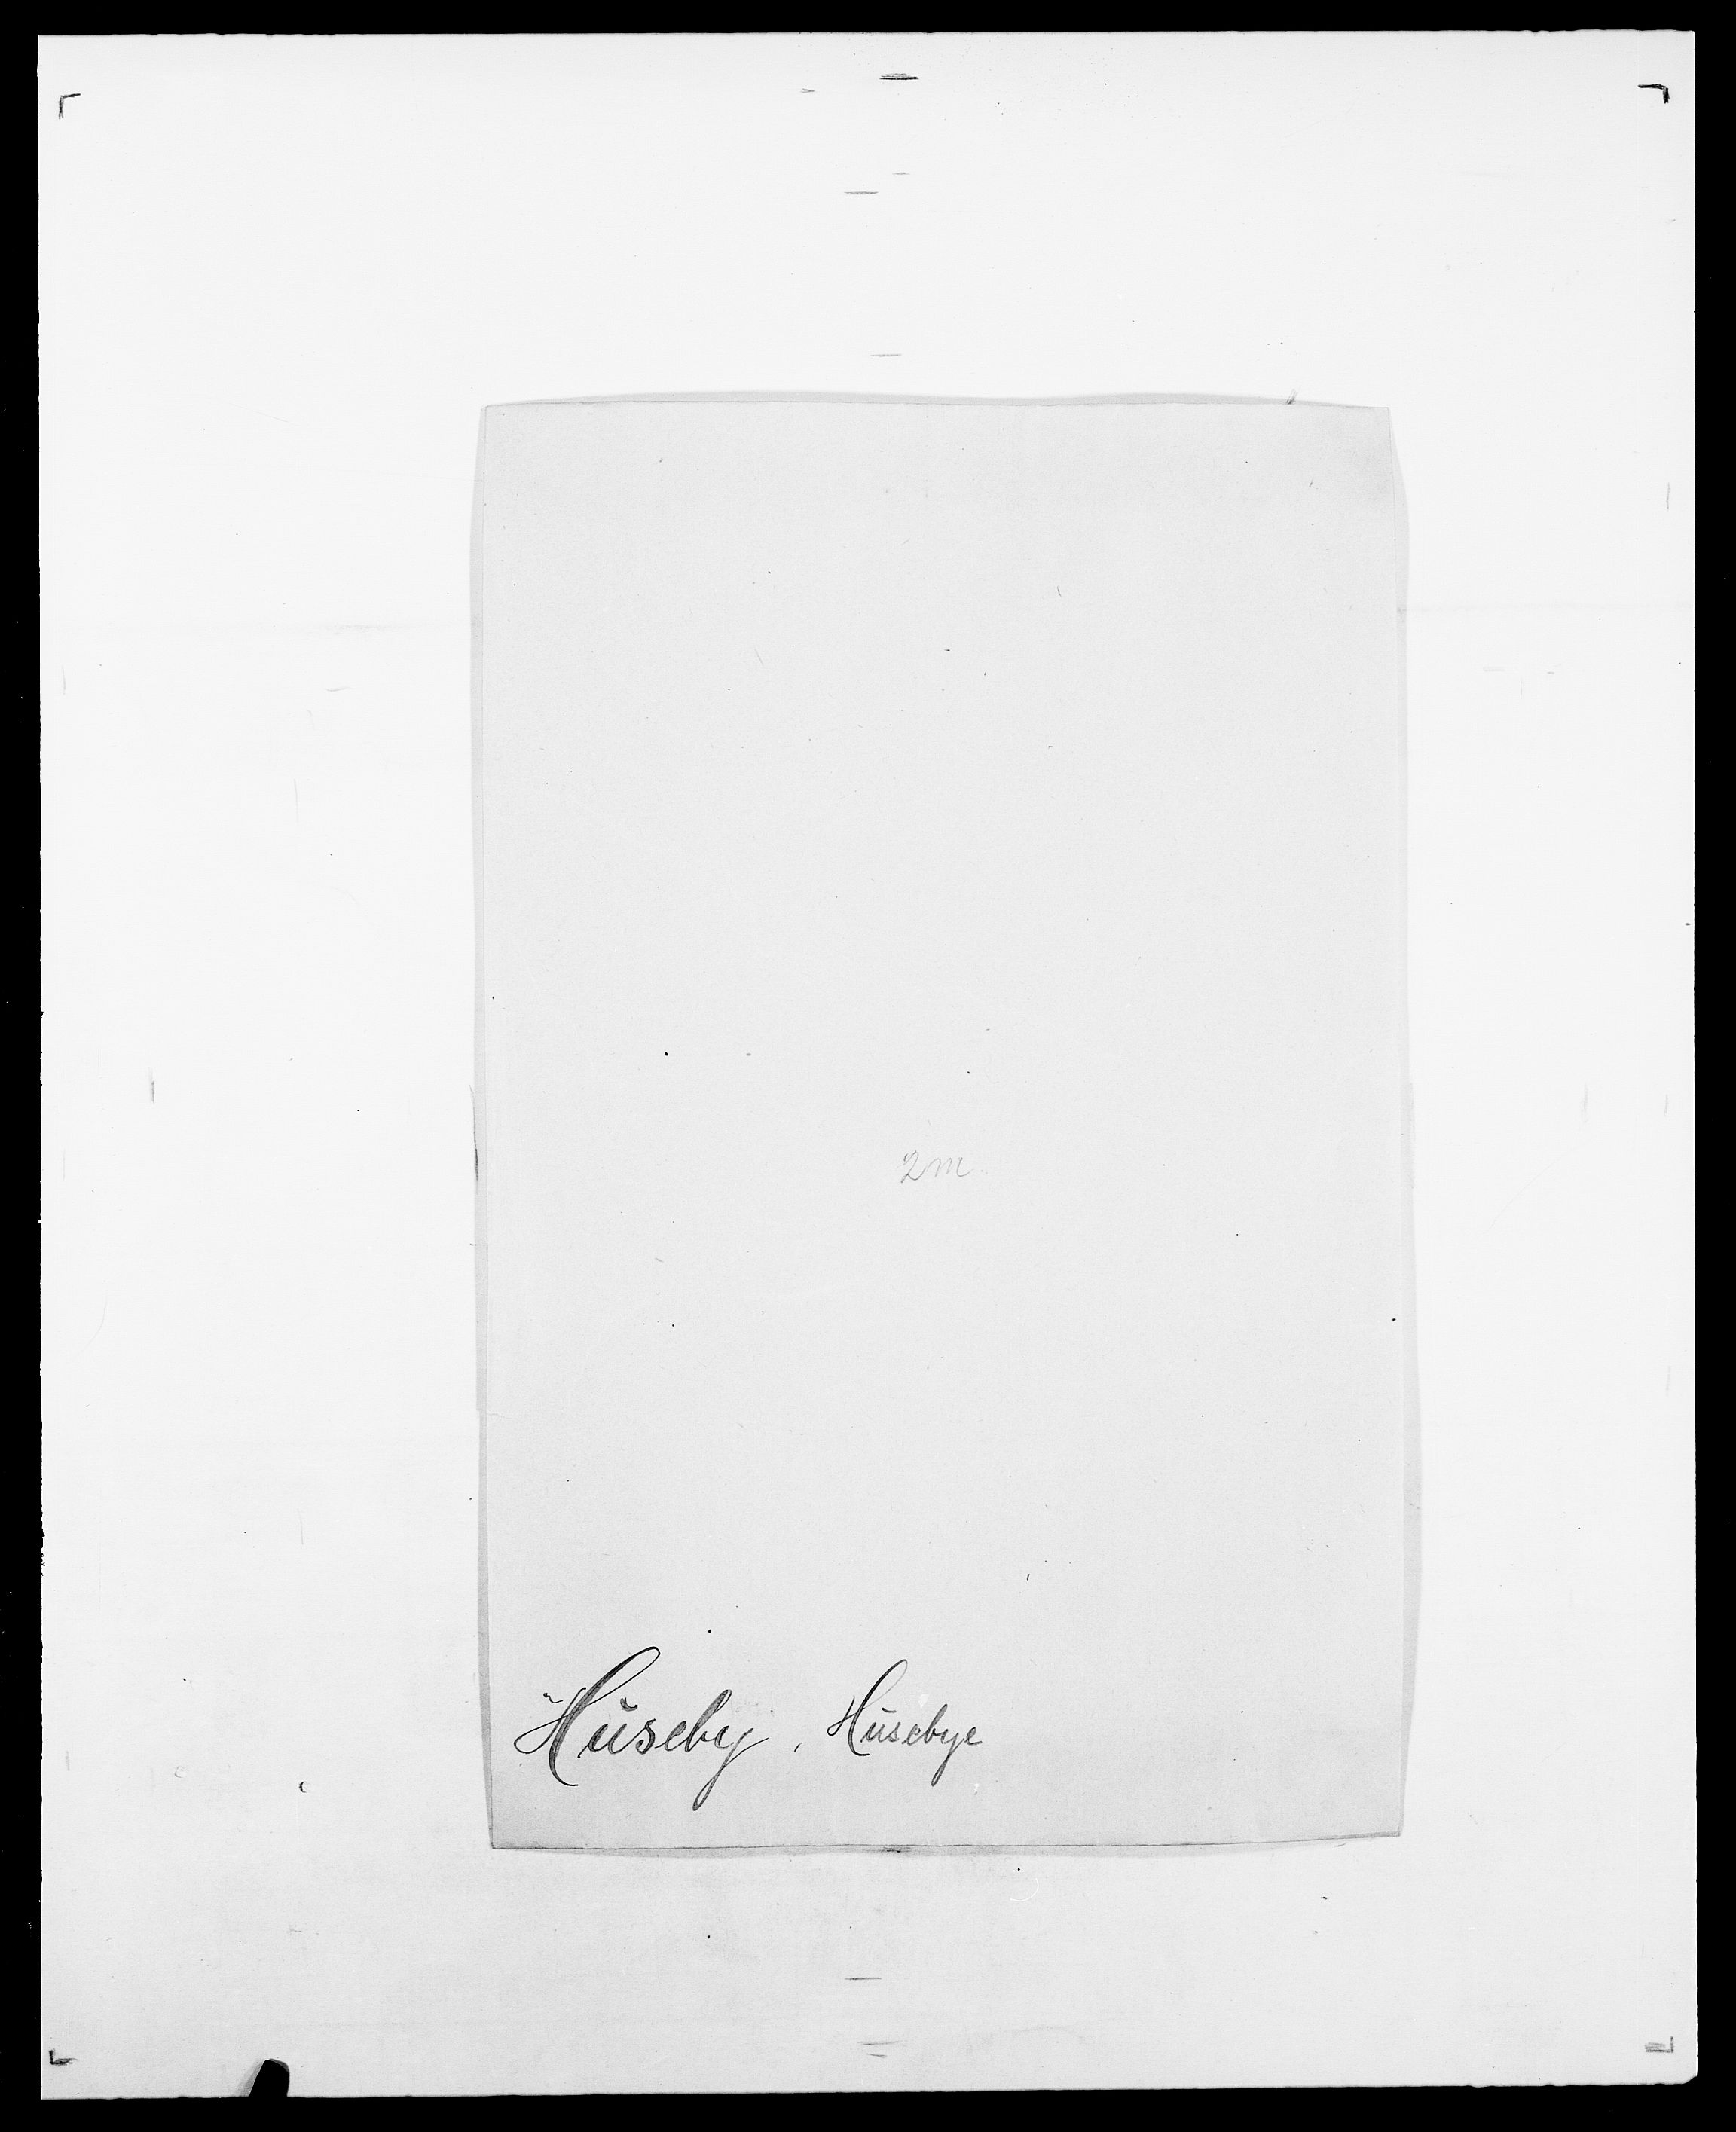 SAO, Delgobe, Charles Antoine - samling, D/Da/L0019: van der Hude - Joys, s. 78